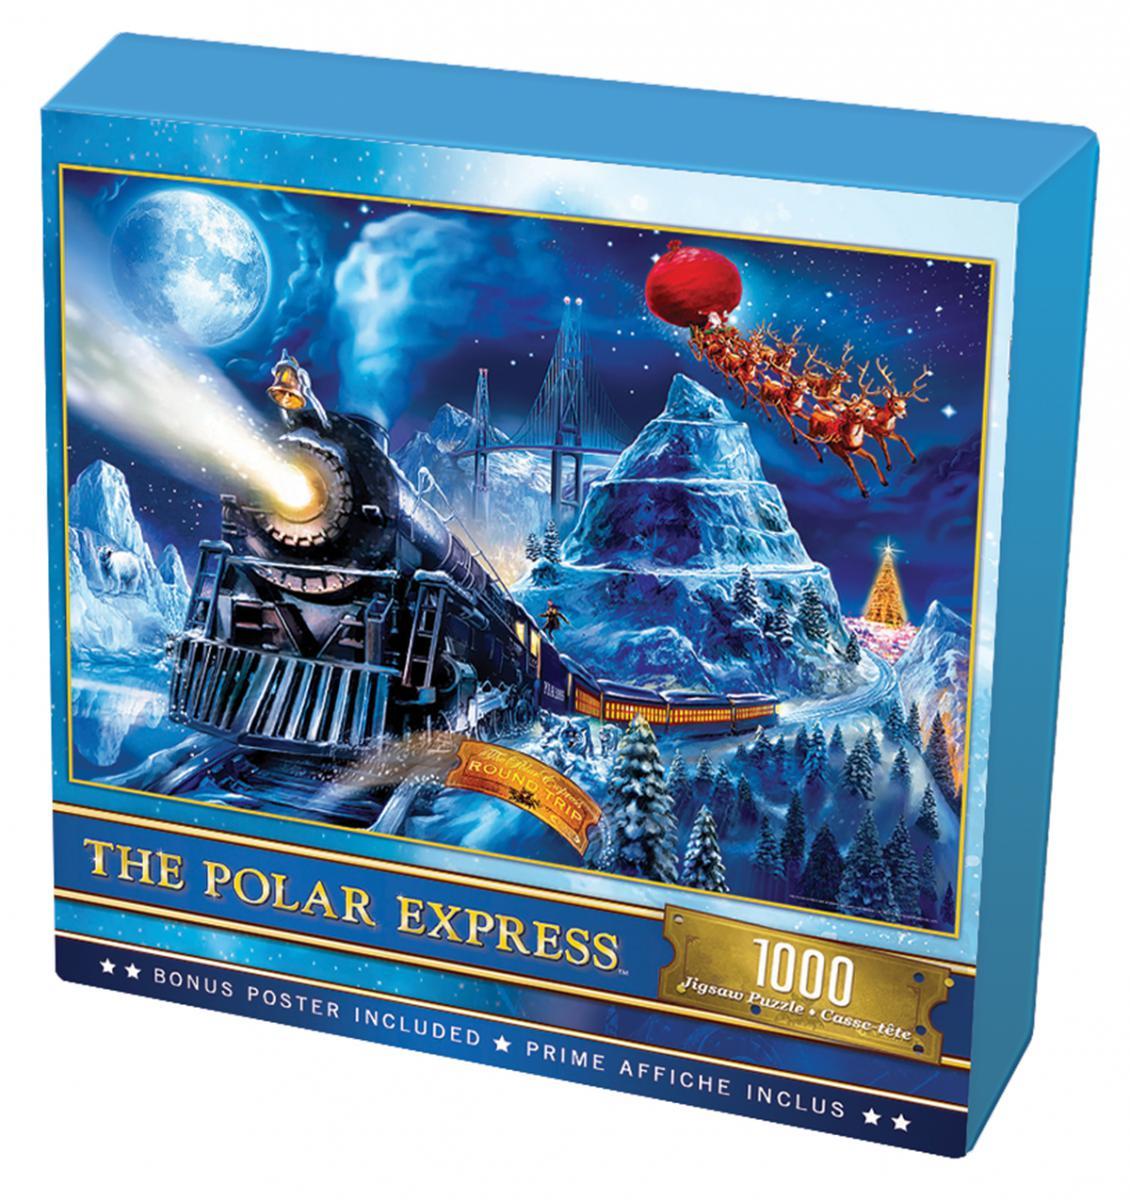 The Polar Express 1000 Piece Puzzle